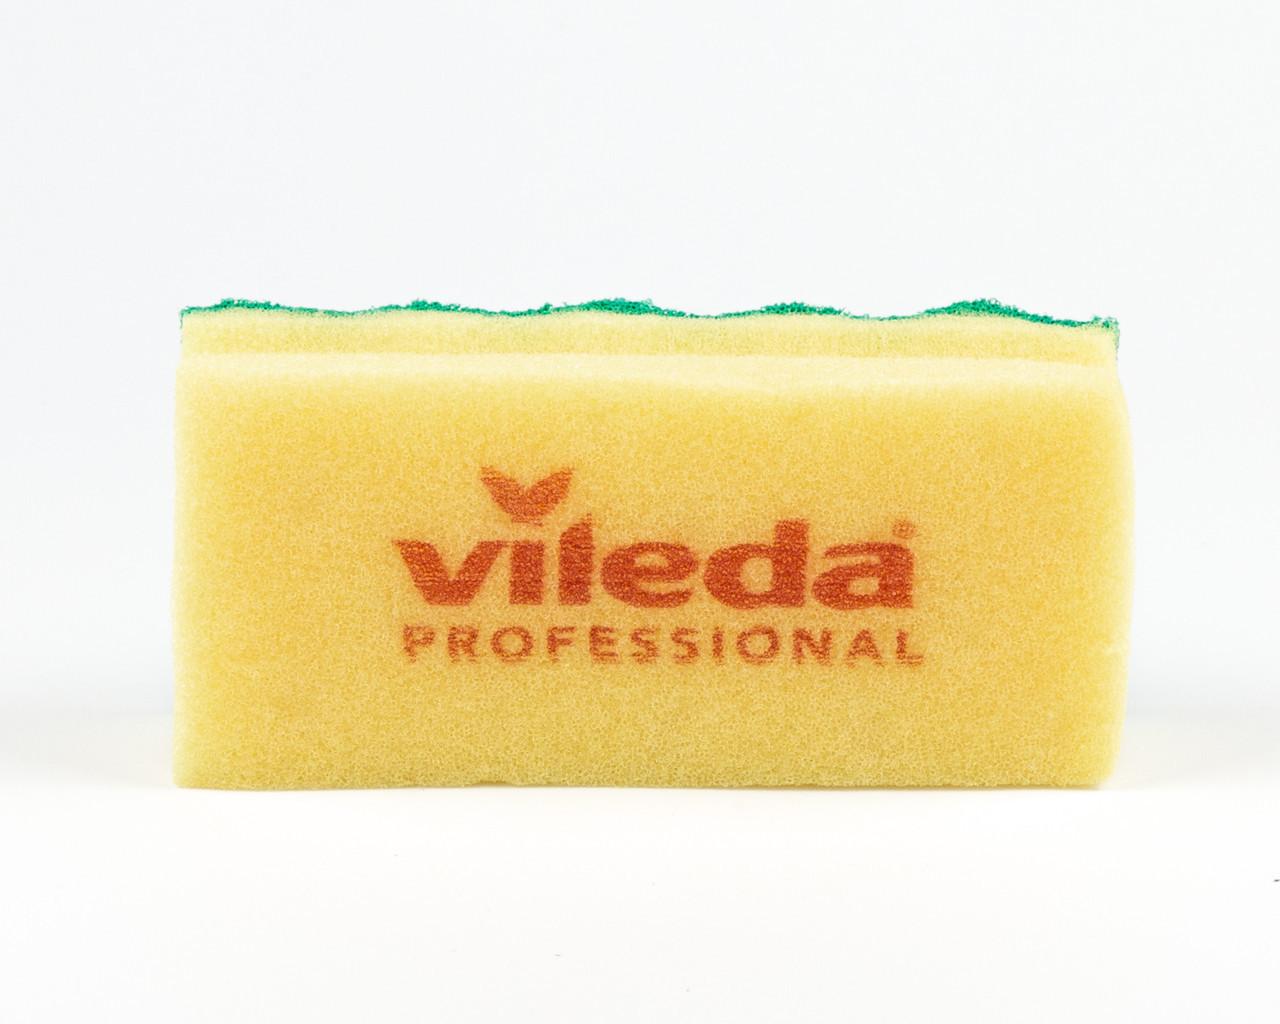 Губка Пур Актив желтая, 7х15 см, Vileda